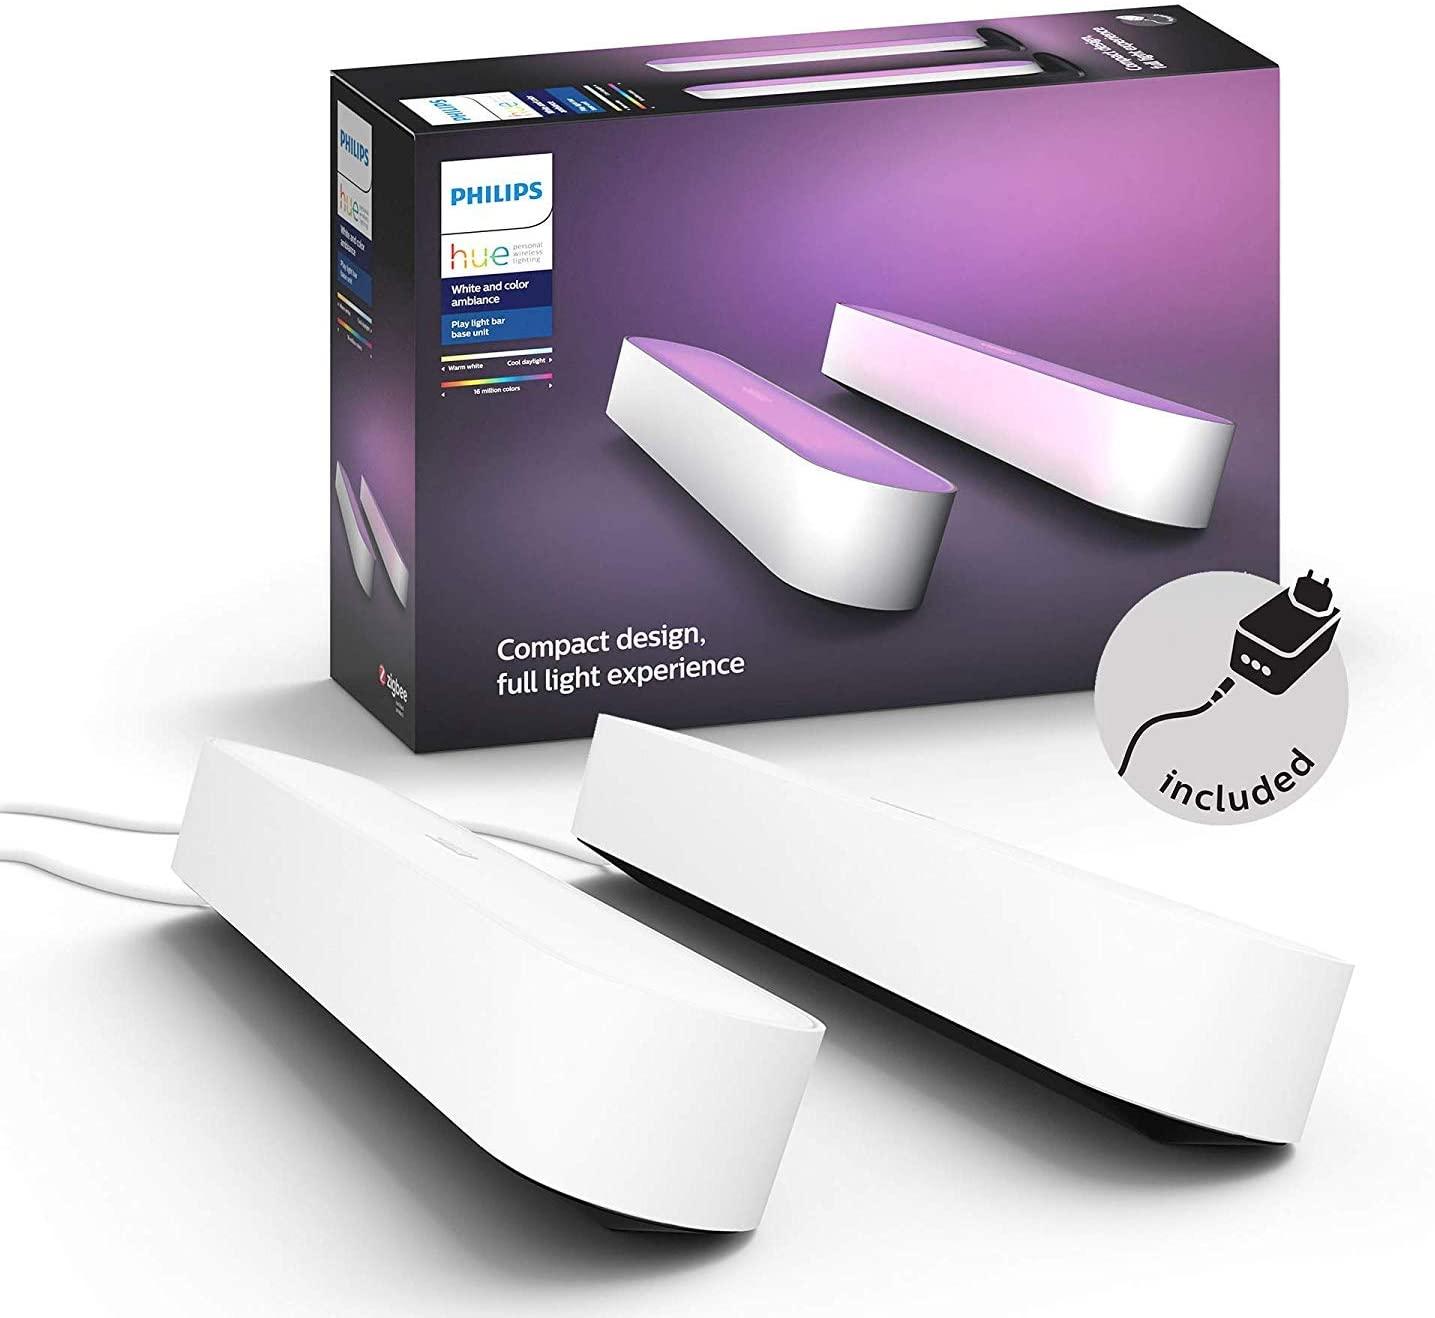 Philips HUE barras de luces solo 80.6€ [+ otras ofertas Hue]